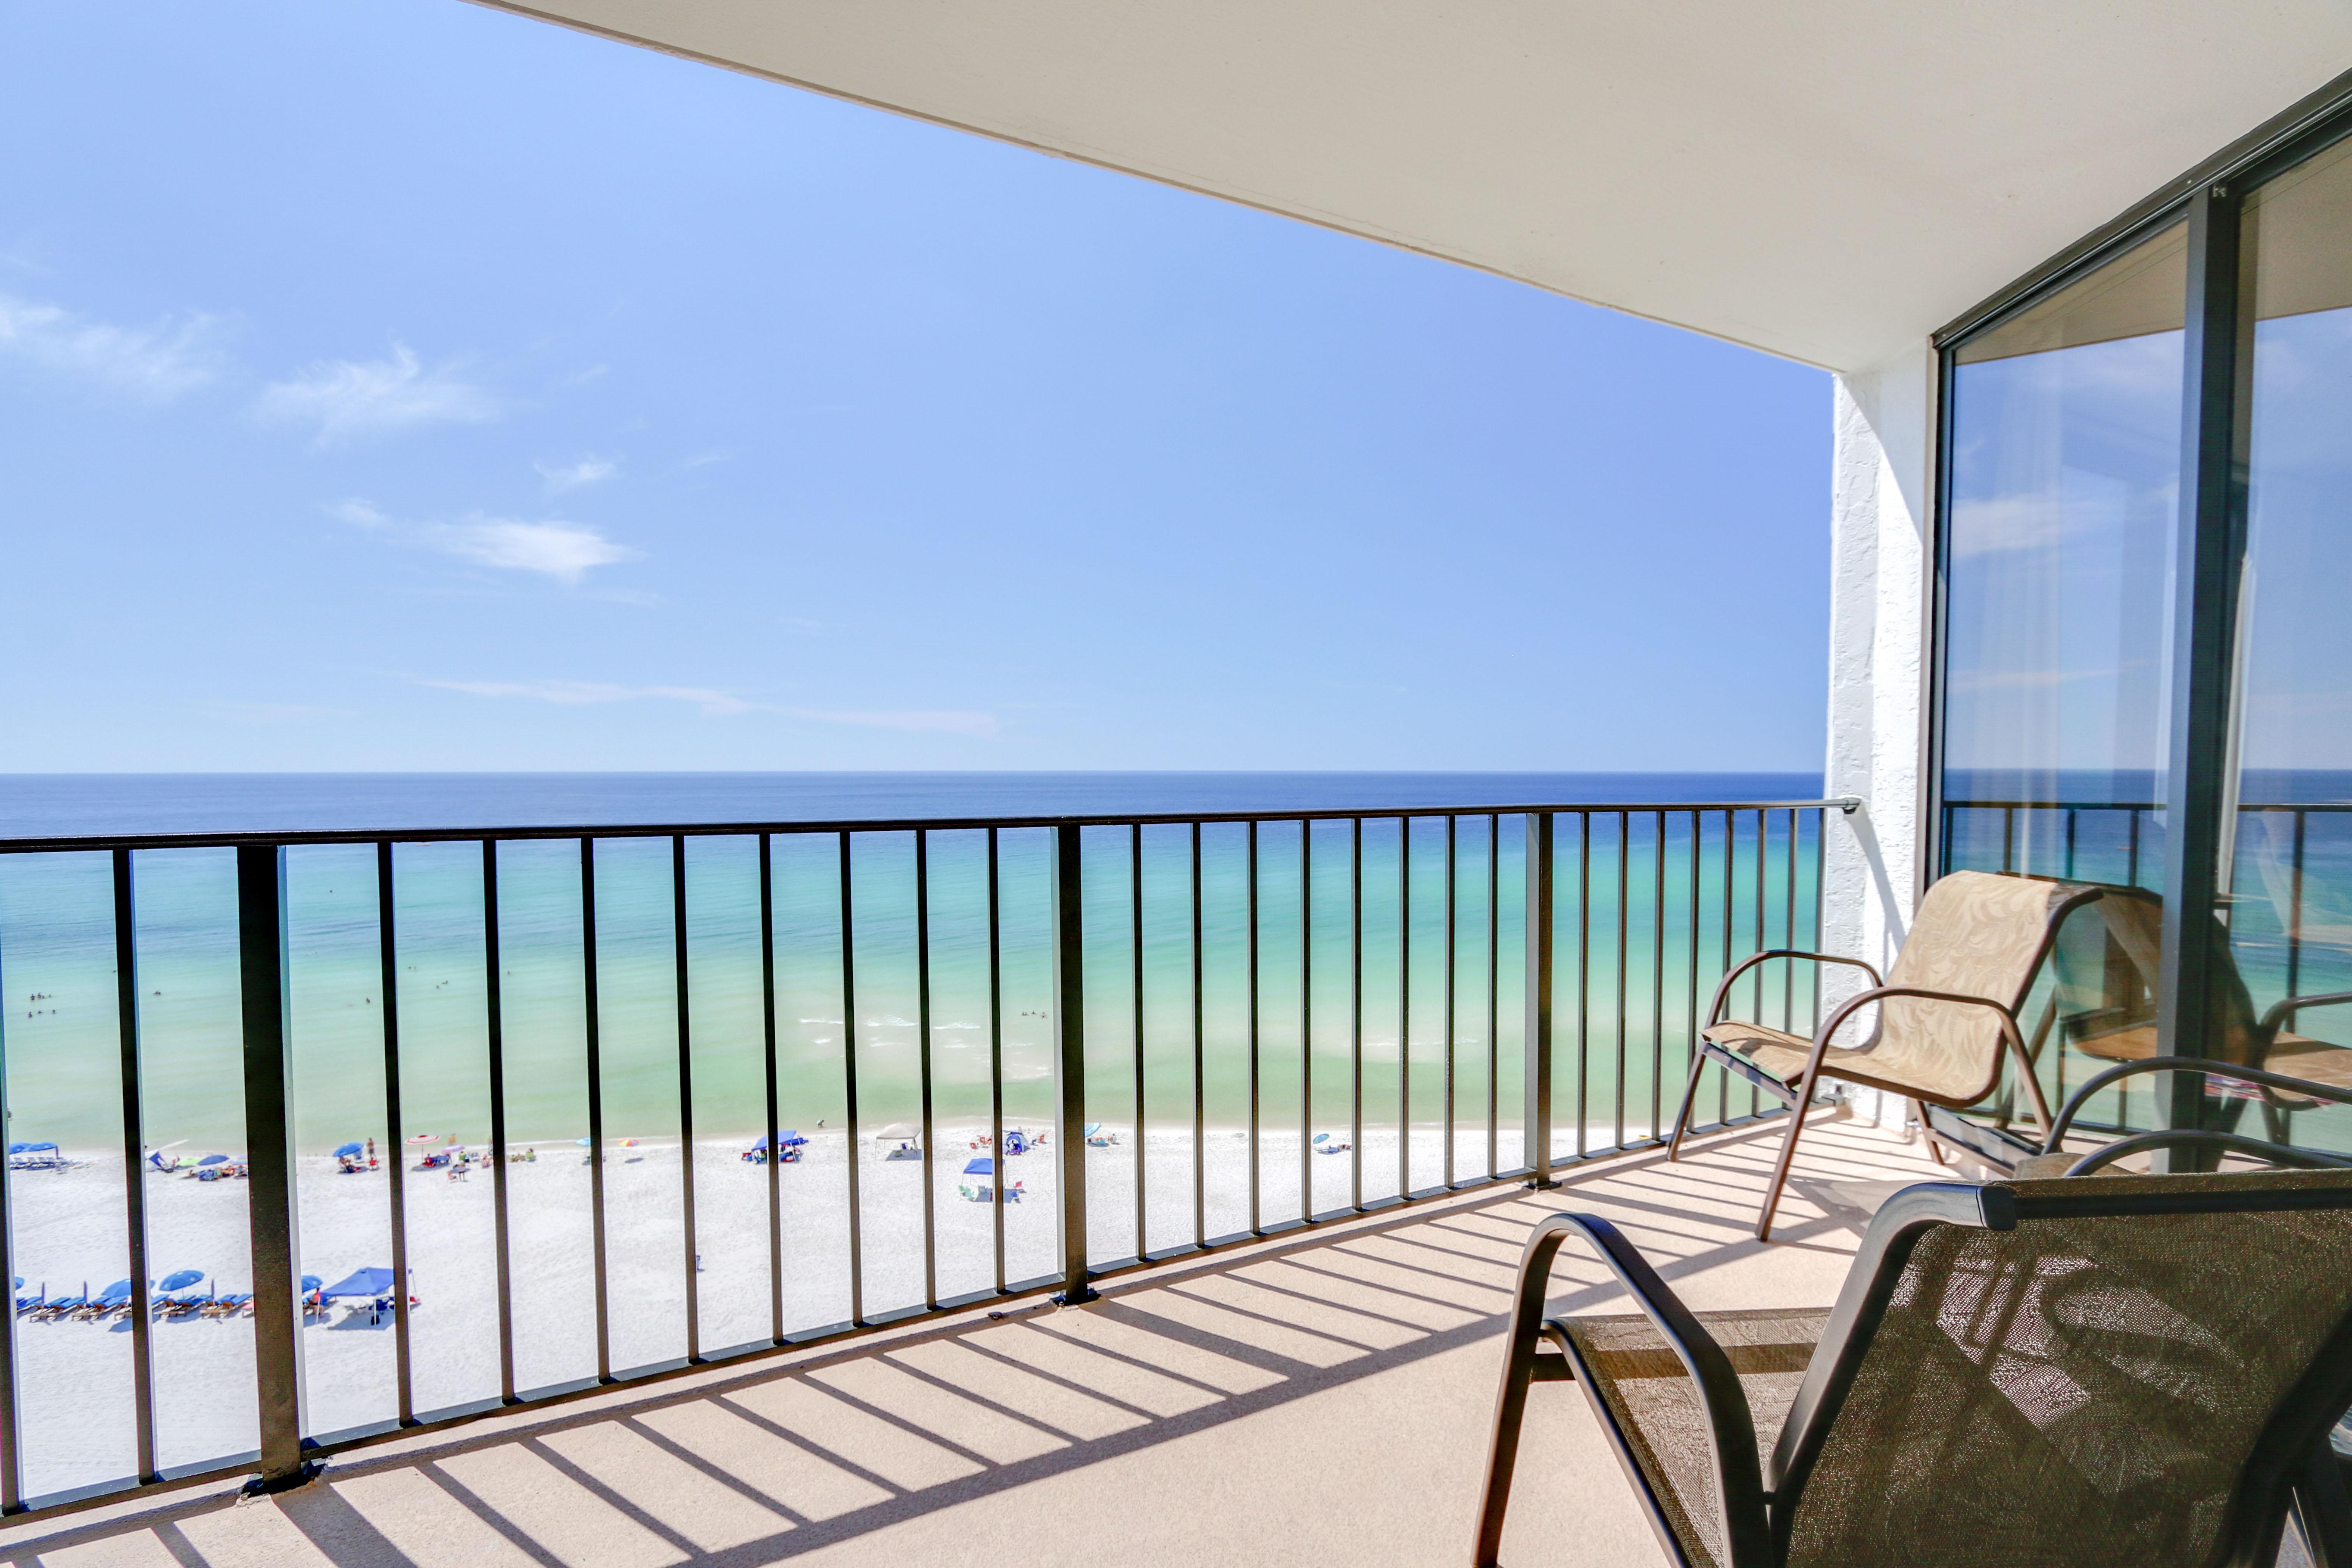 Edgewater Beach Resort 1009 2 Vacation Rental in